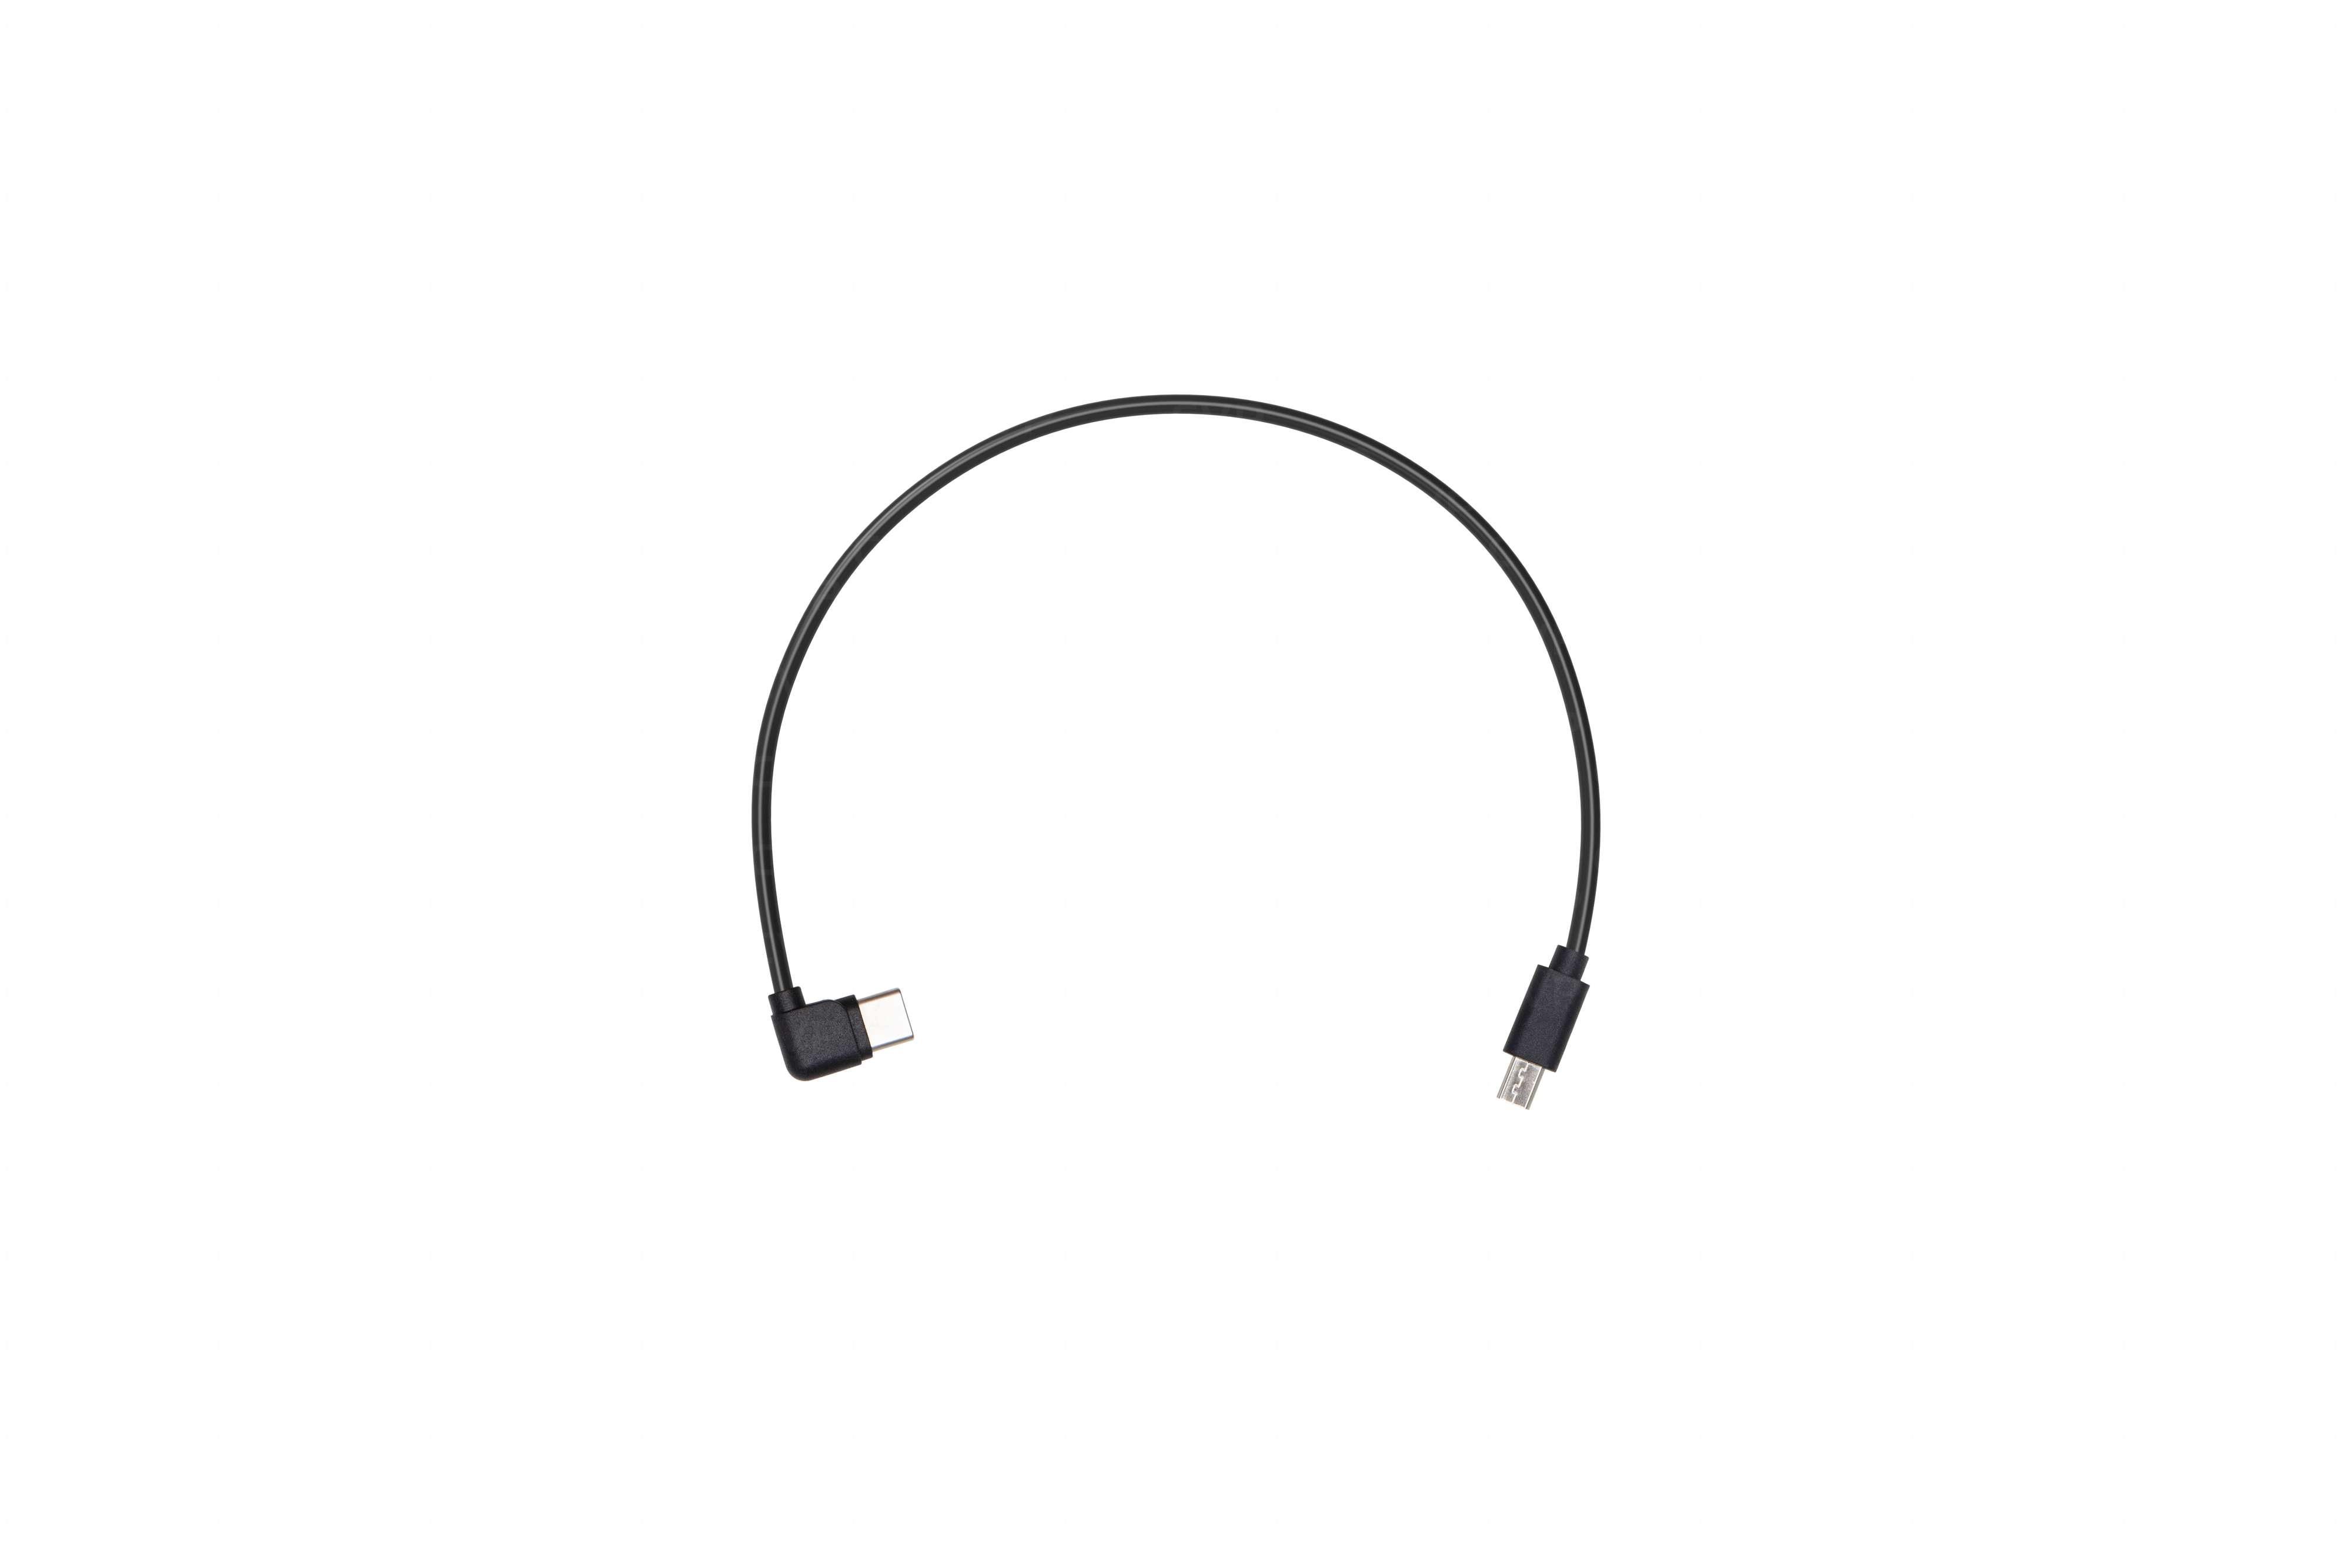 USB Кабель Ronin SC Part 1 Multi-Camera Control Cable (Multi-USB)-0